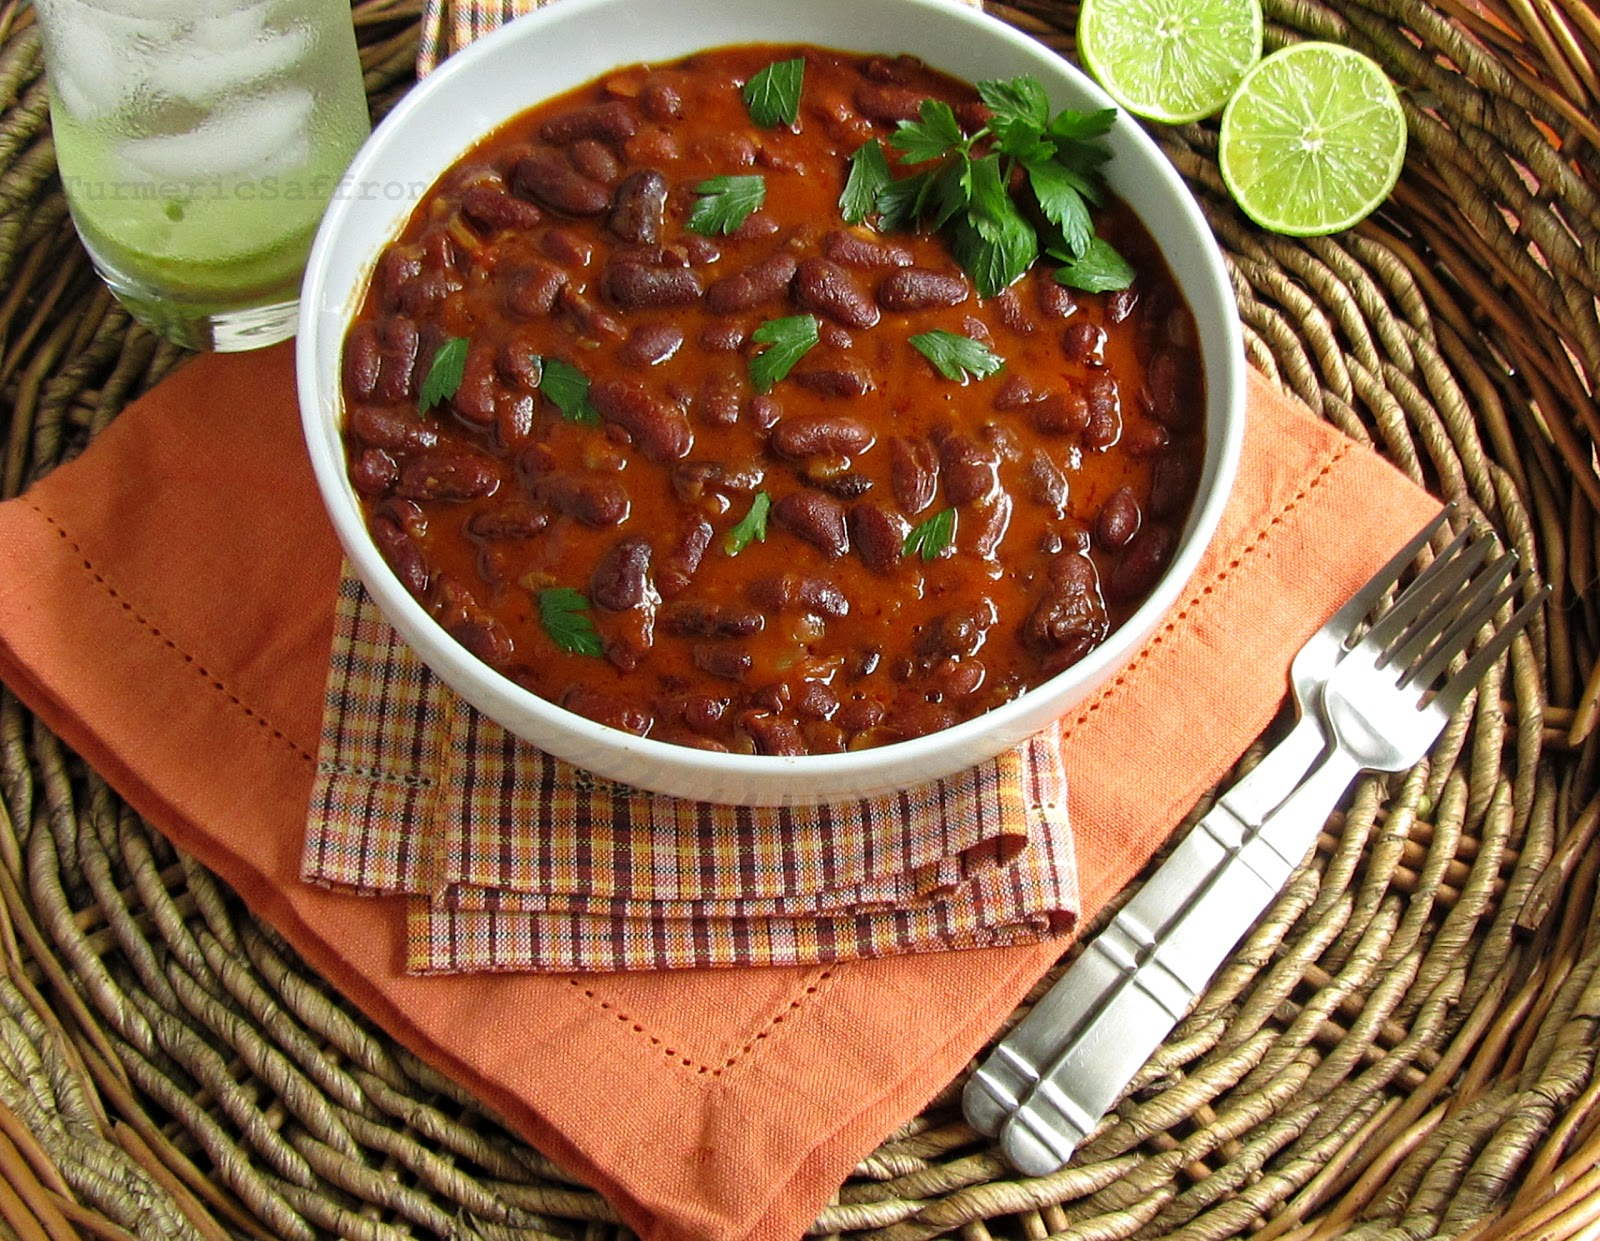 Turmeric saffron khorak e loobia red kidney beans side dish khorak e loobia red kidney beans side dish repost forumfinder Images